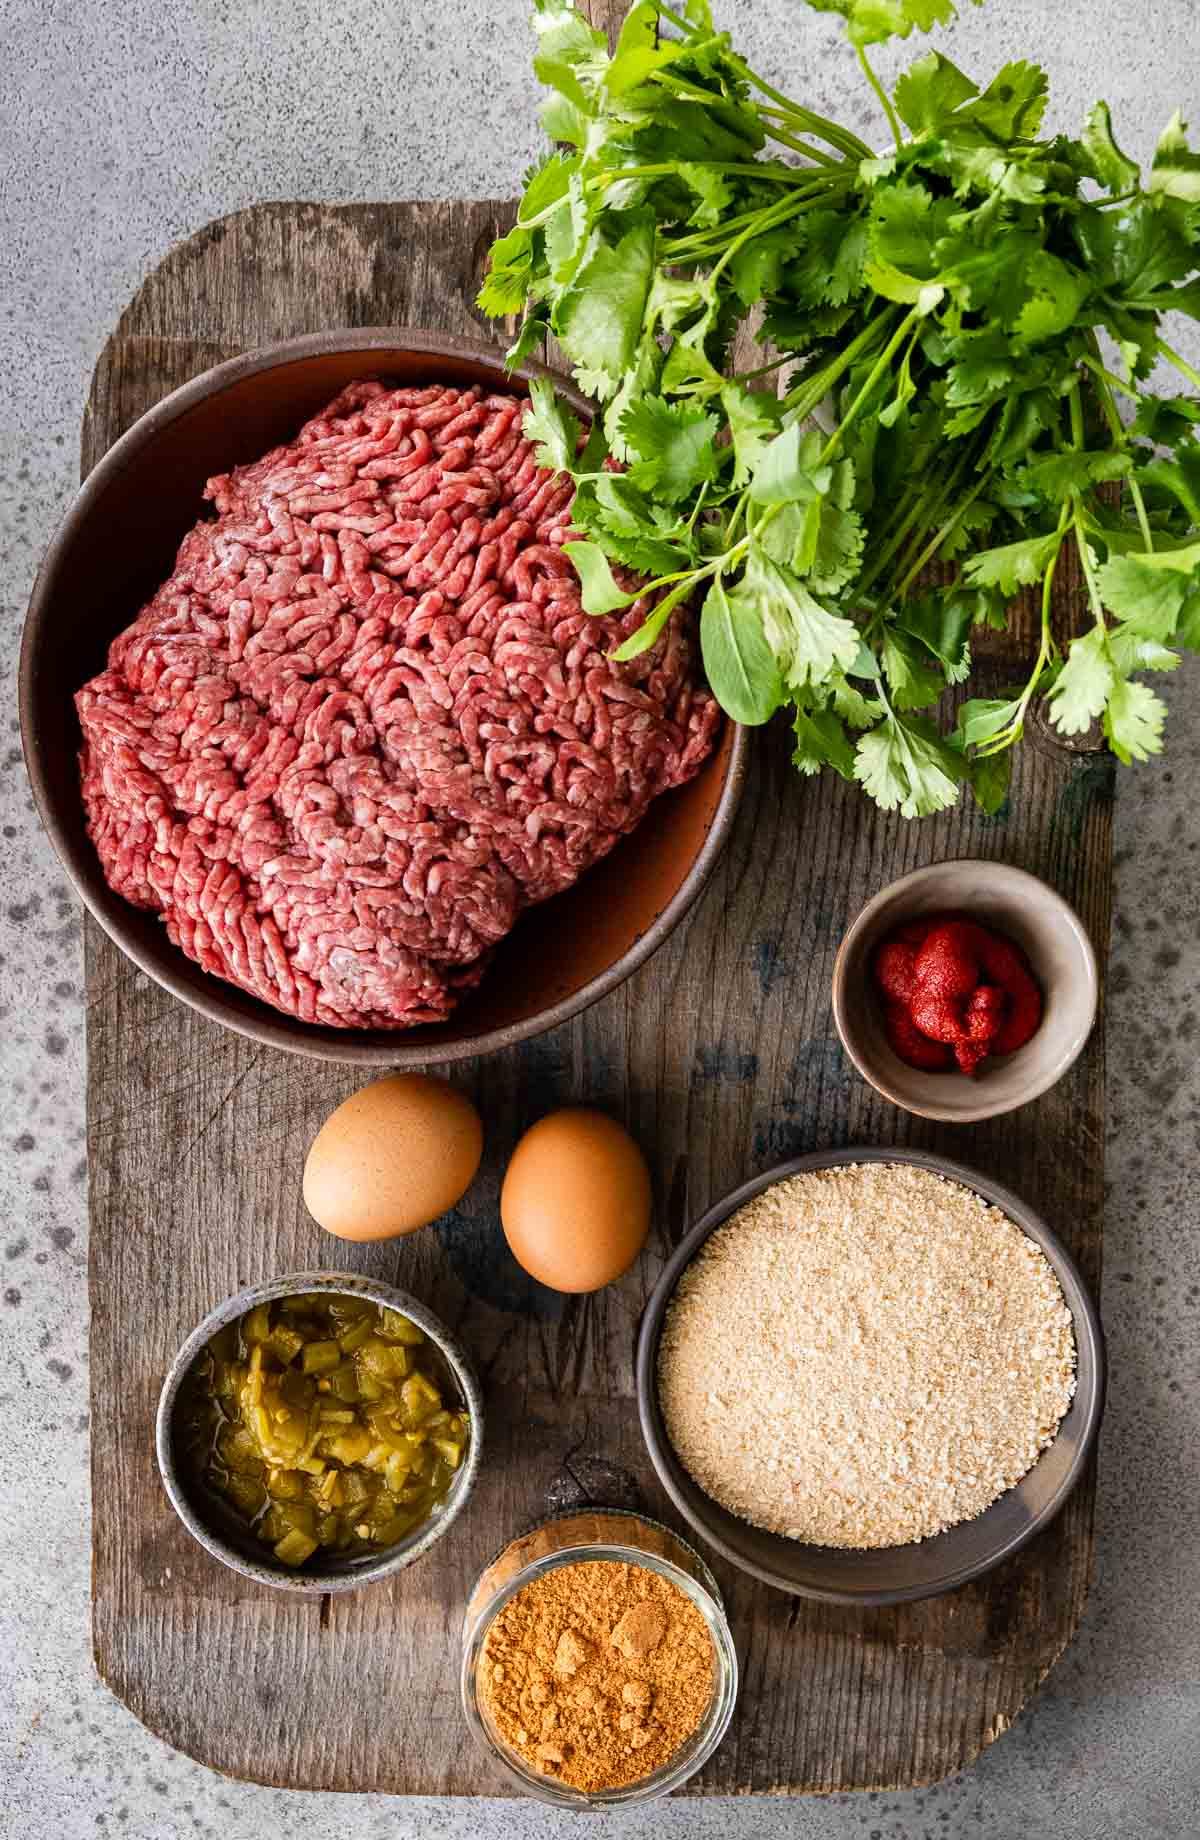 Taco Meatballs ingredients in prep bowls